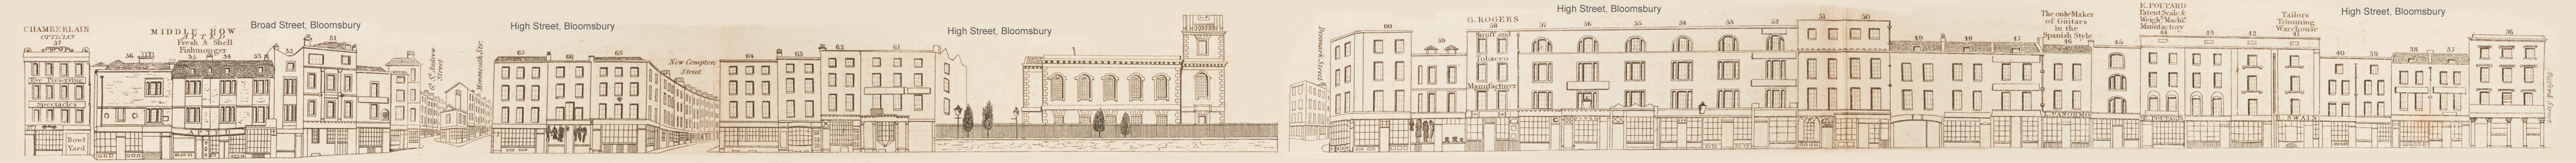 map - Tallis's London street views : No. 27. Broad Street, Bloomsbury (south)